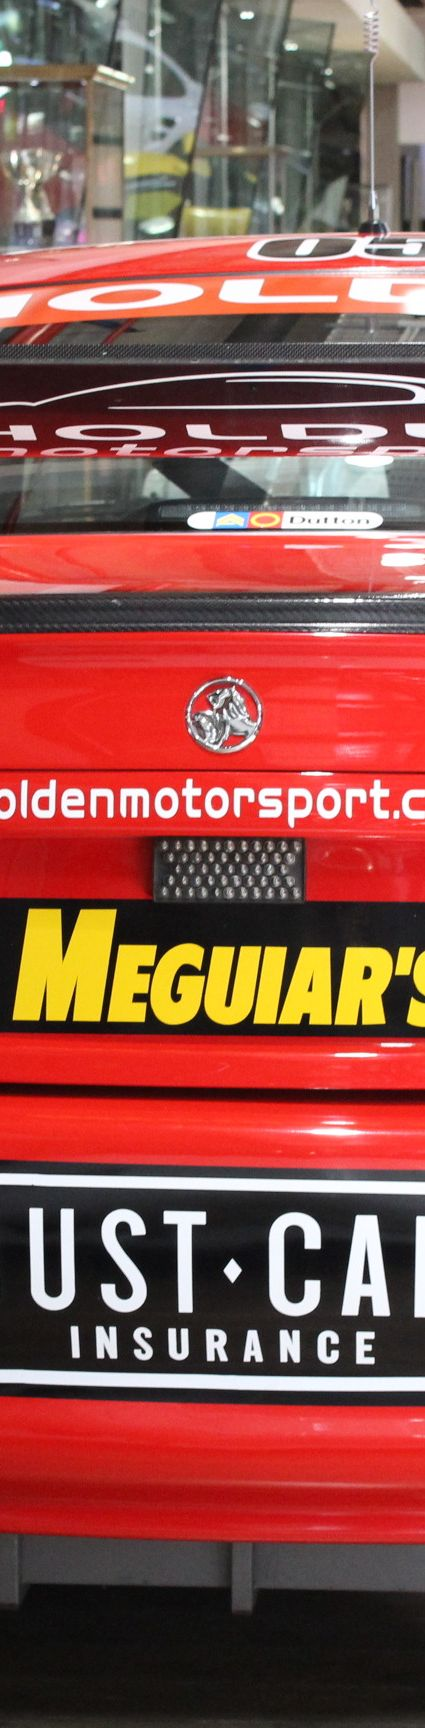 2003 Holden Monaro 427 - by Gary Rogers Motorsport. - for sale in Australia